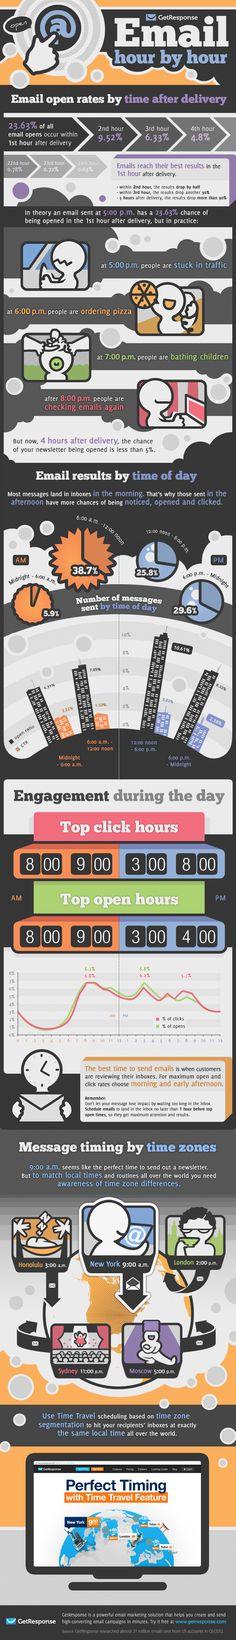 Las mejores horas para el email #infografia #infographic #marketing #internet - by Bootcamp Media ( #Marketing #SEO #Infographics )